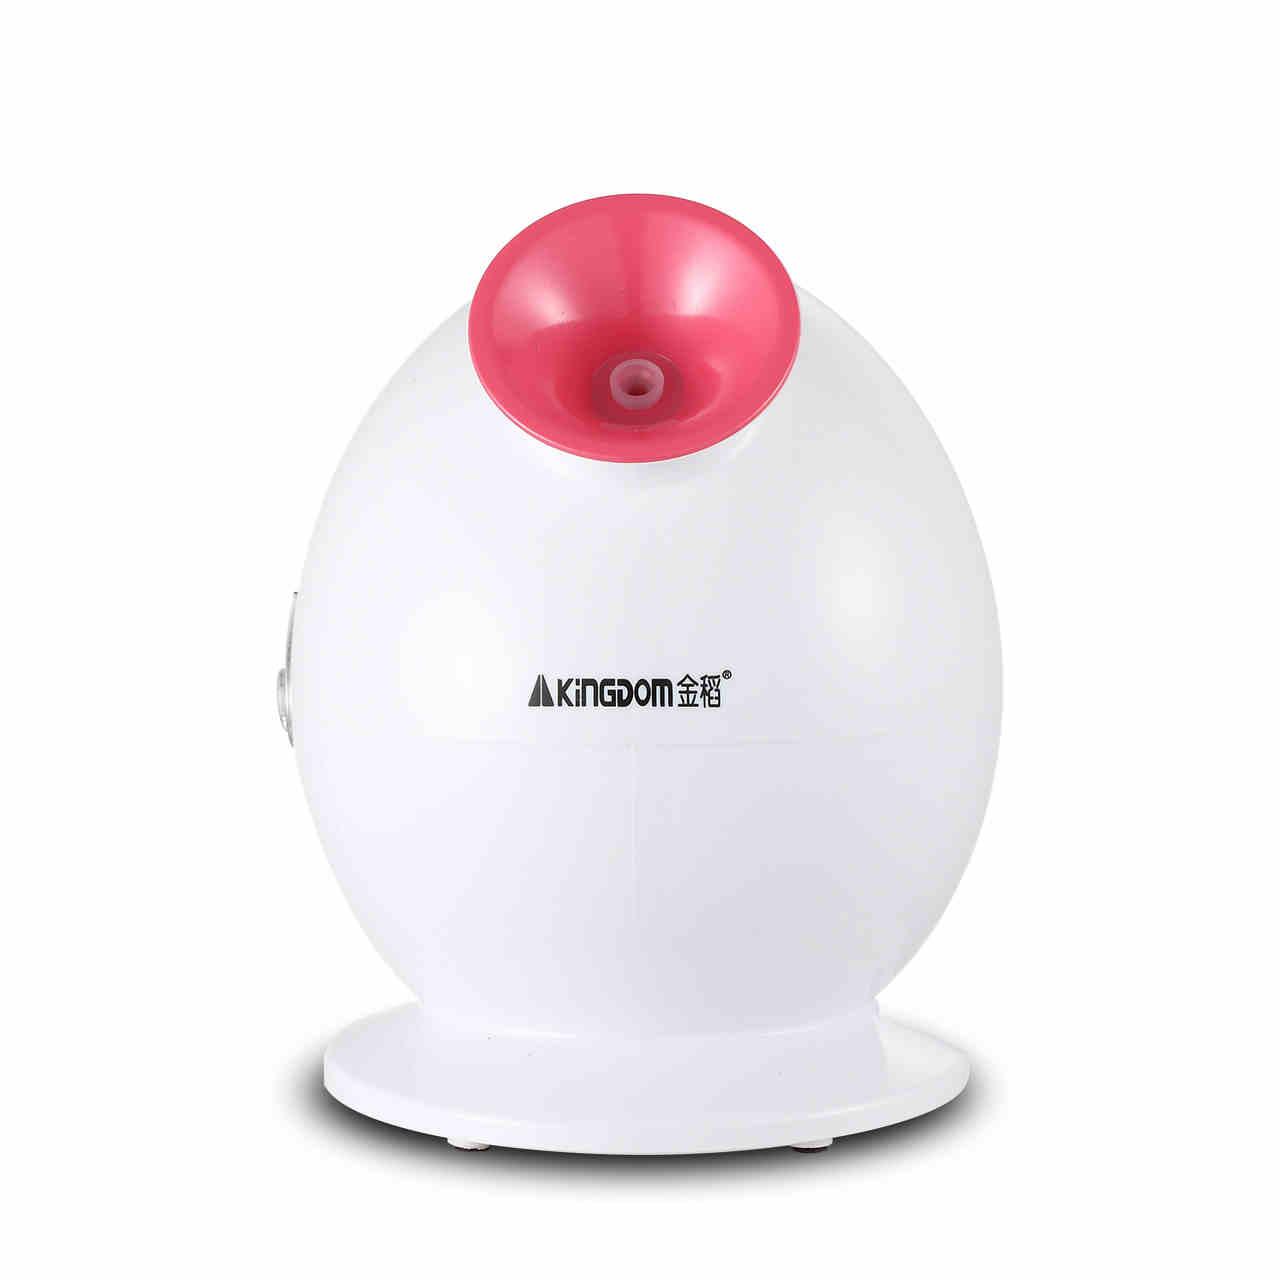 KD233金稻蒸脸器美容仪Q版家用喷雾机热喷蒸面器补水仪器蒸脸机